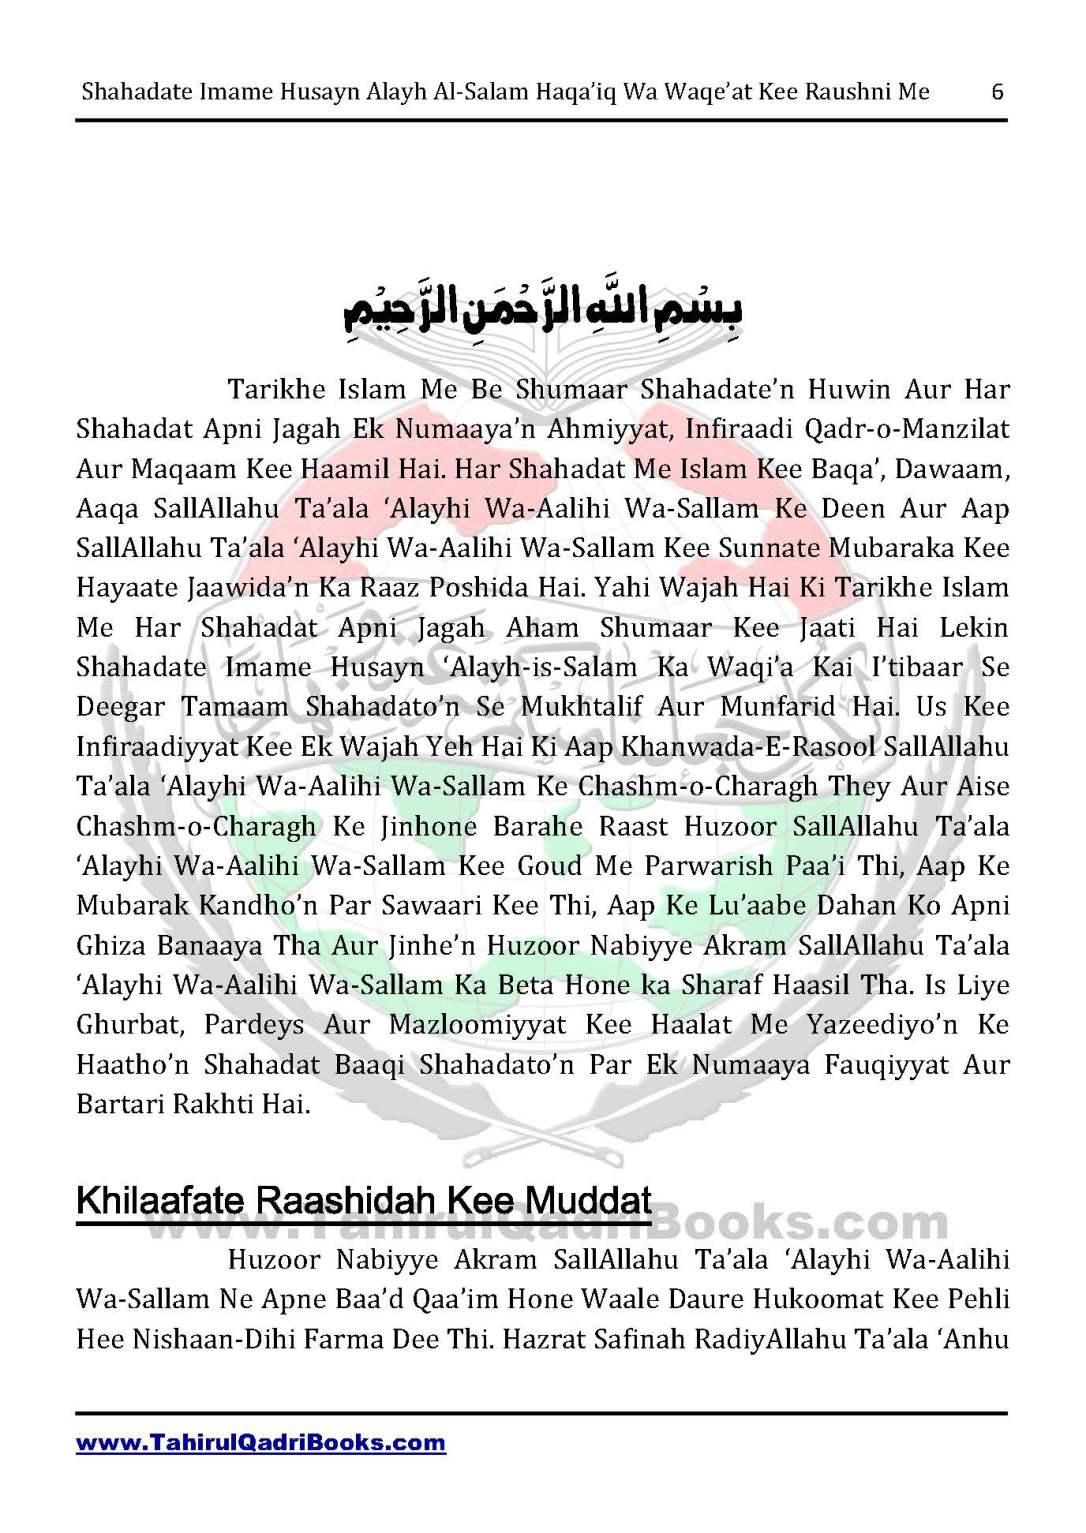 shahadate-imame-husayn-alayh-is-salam-haqaiq-wa-waqe_at-kee-raushni-me-in-roman-urdu-unlocked_Page_06